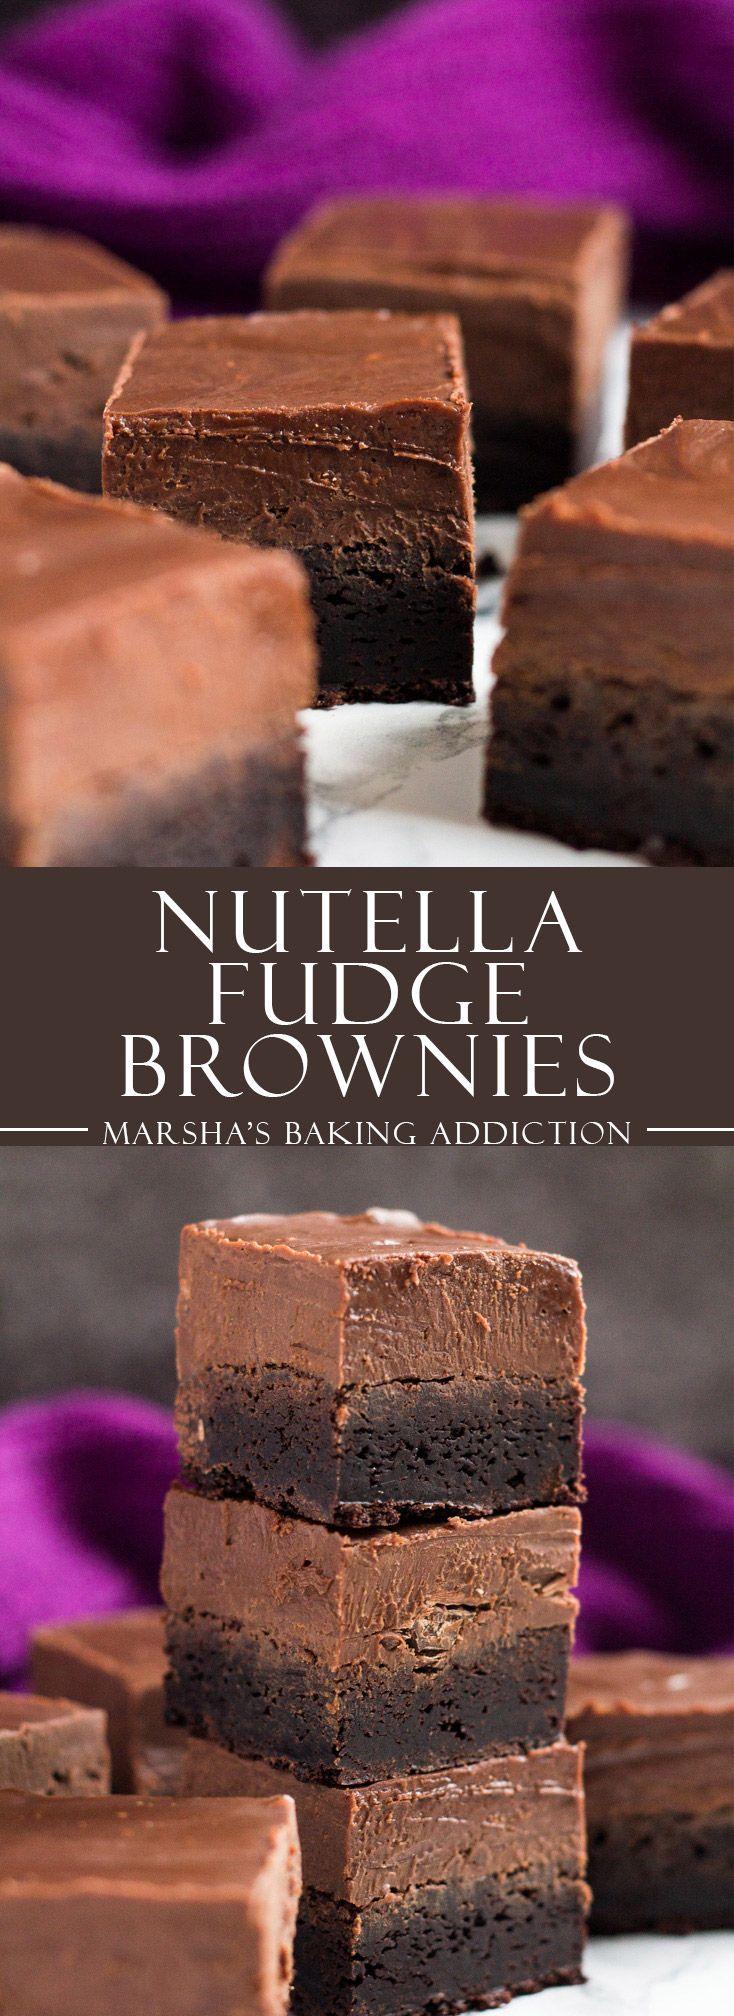 Nutella Fudge Brownies   marshasbakingaddiction.com @marshasbakeblog